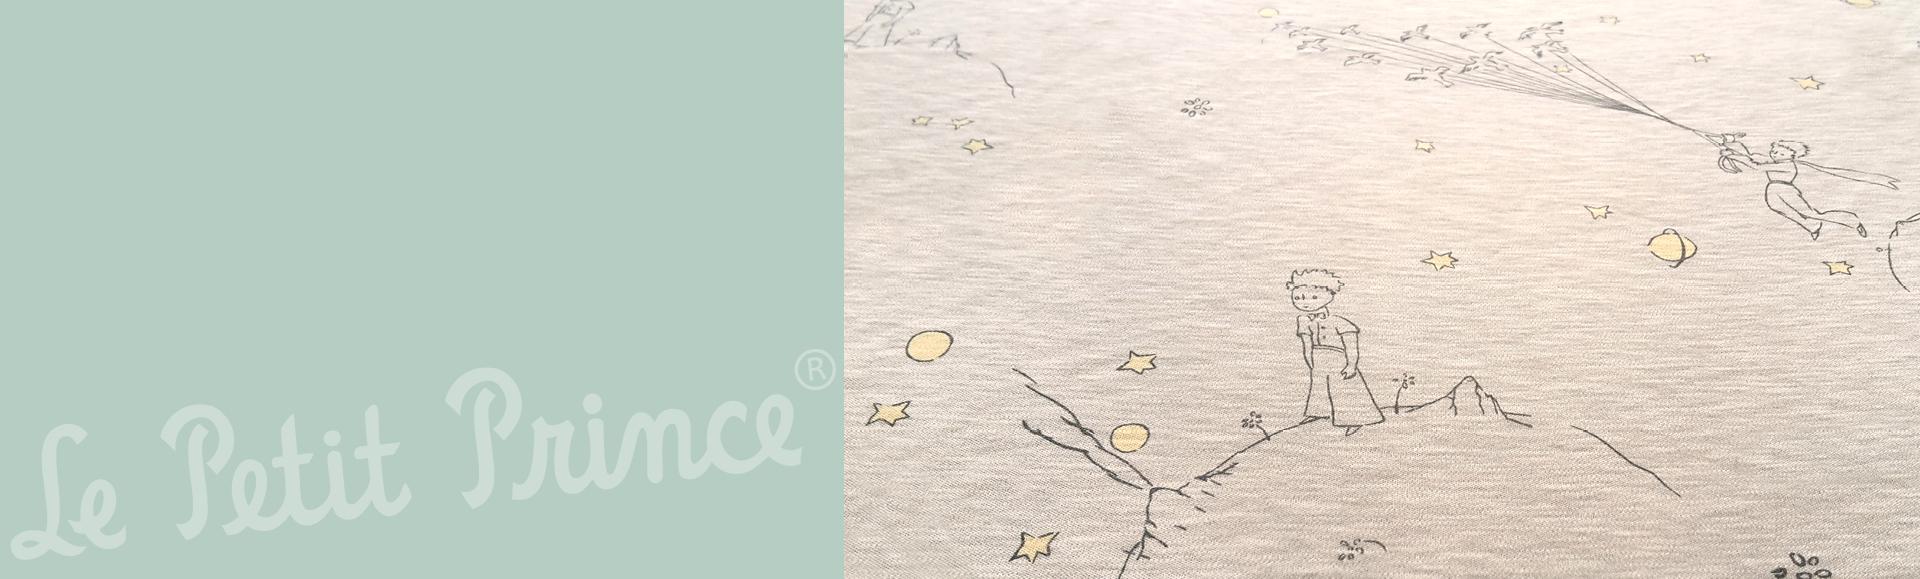 Le Petit Prince by manduca Sling